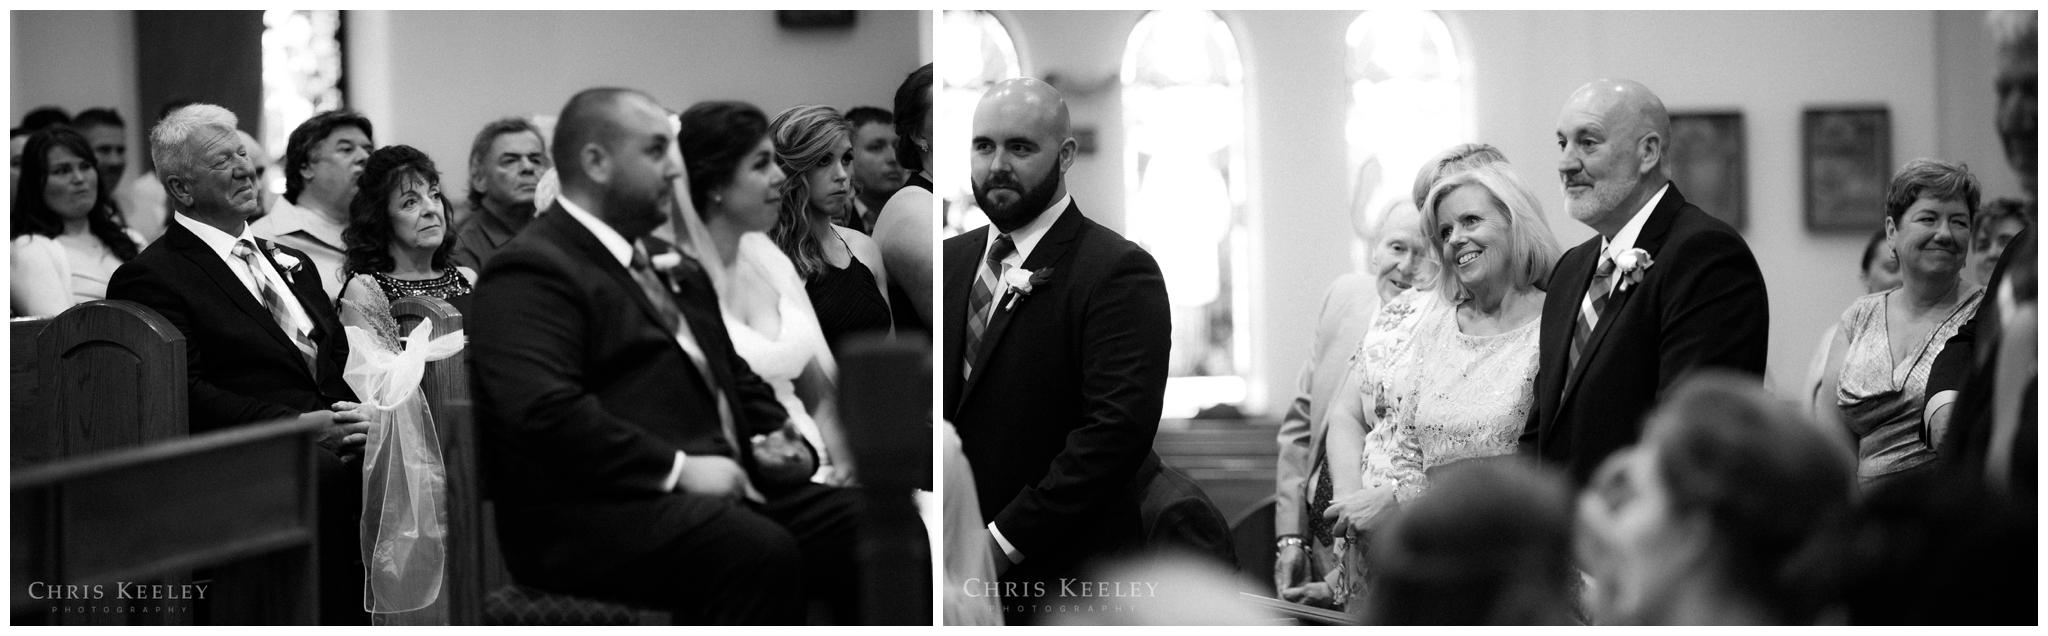 burrows-new-hampshire-wedding-photographer-chris-keeley-30.jpg